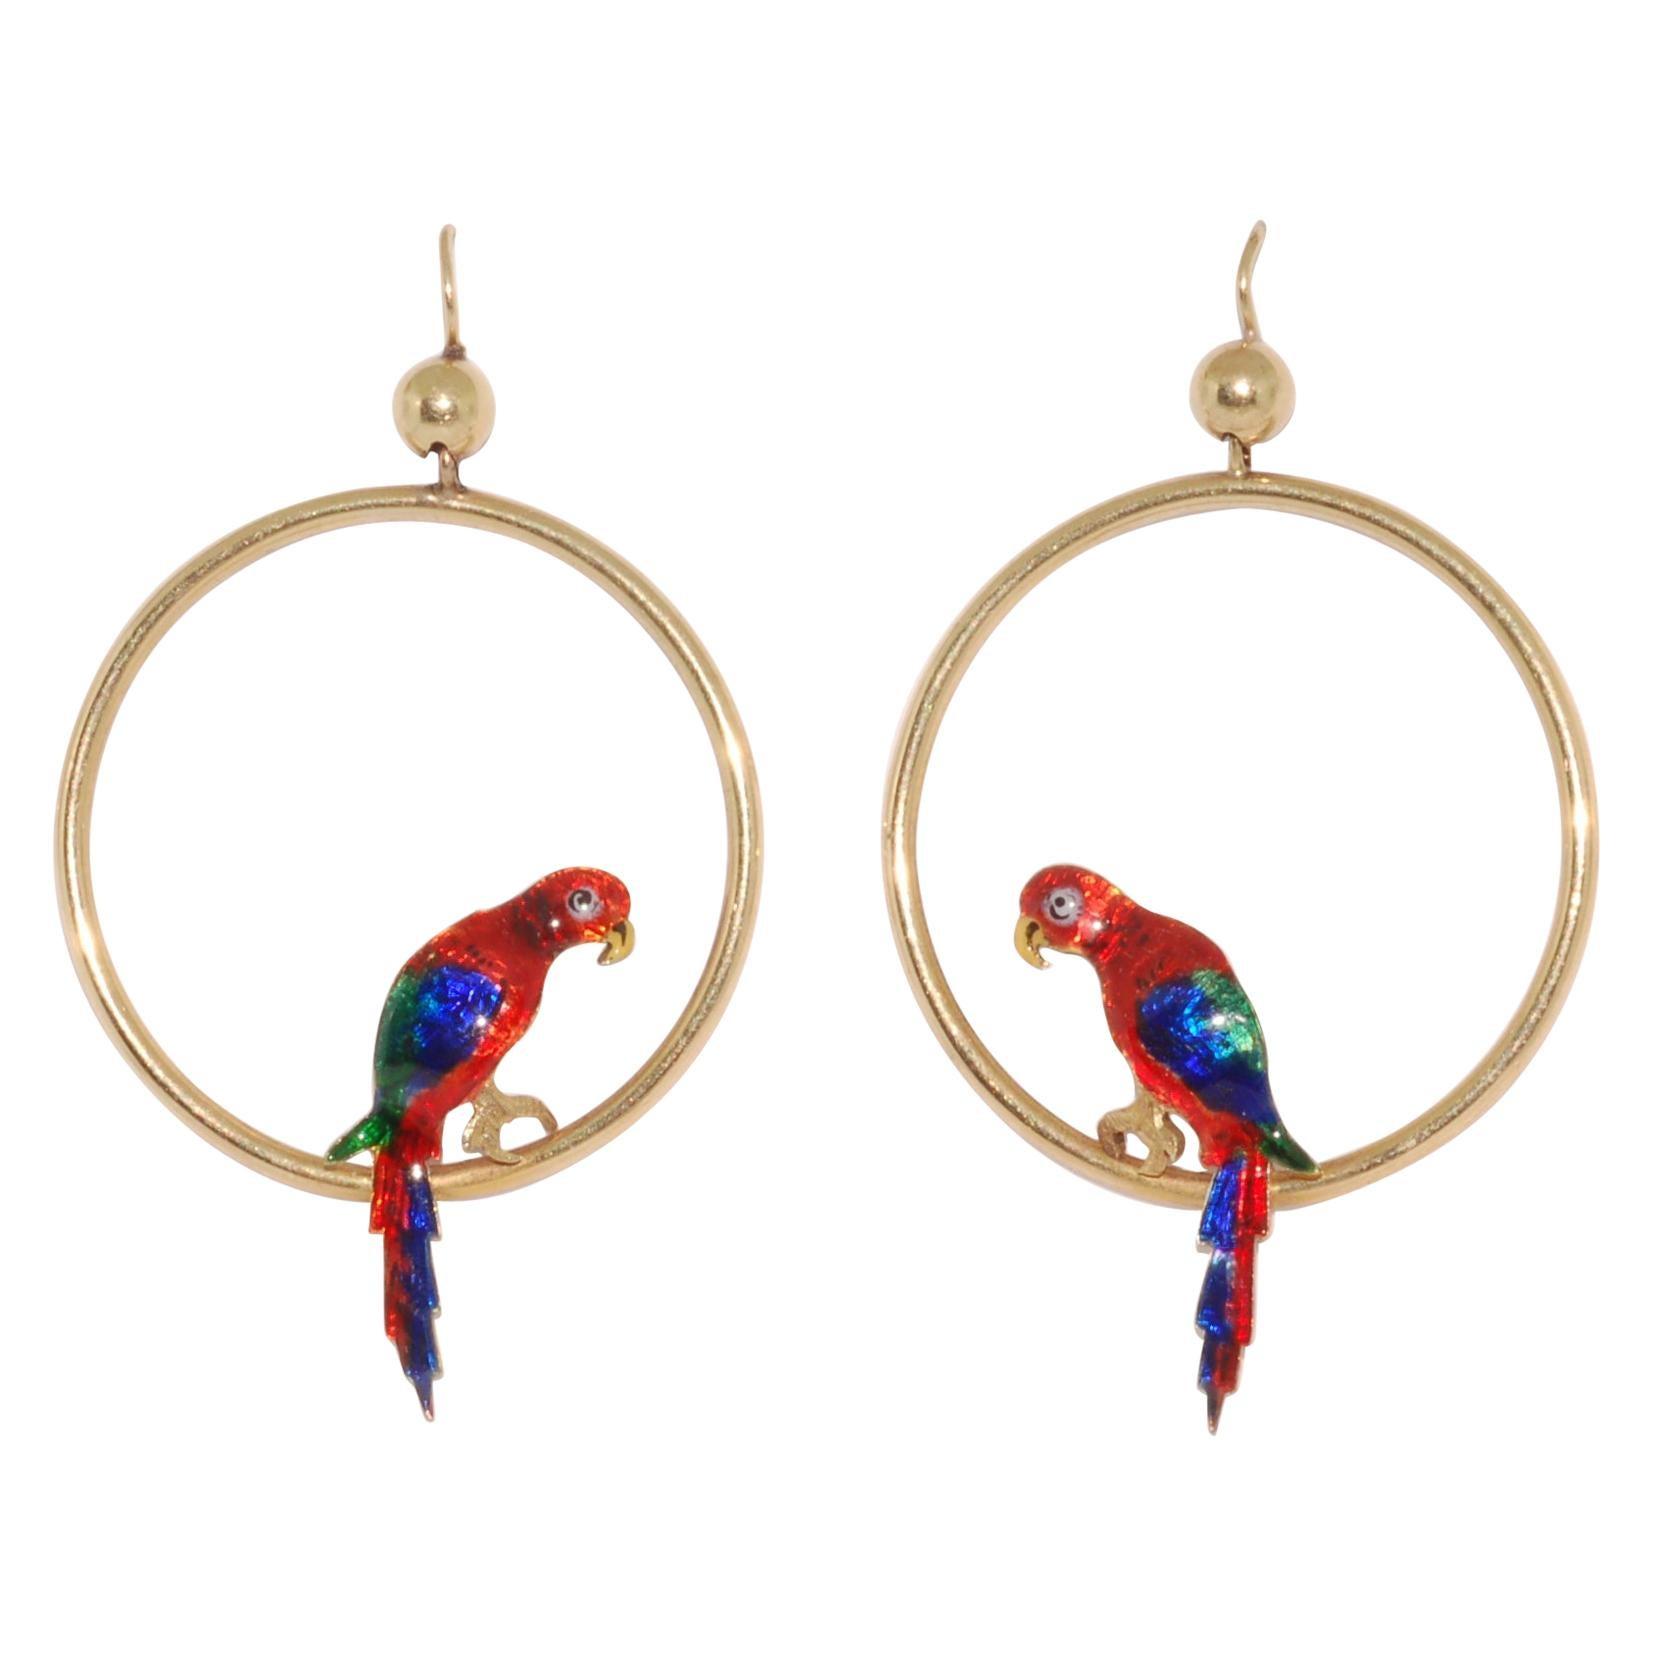 15 Karat Yellow Gold Enamel Parrot Hoop Earrings, circa 1920s